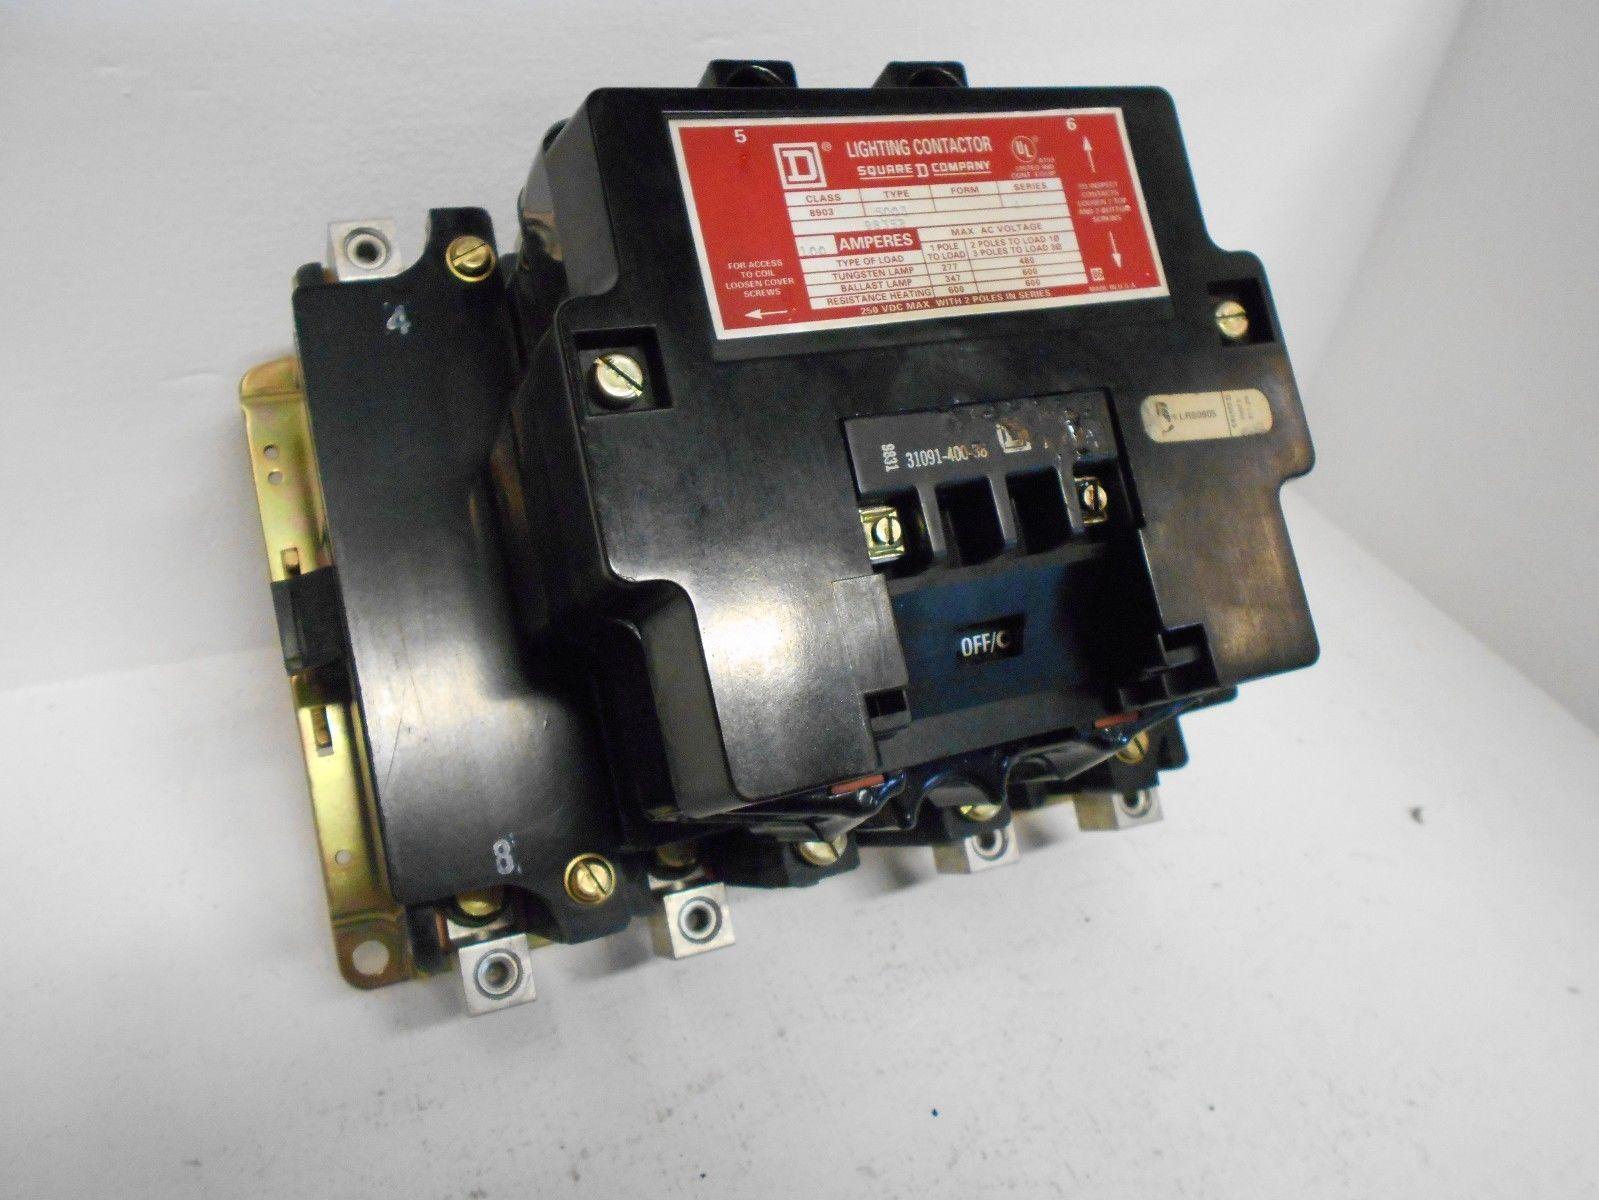 SQUARE D LIGHTING CONTACTOR 8903SQO3V02 4 POLE 100 AMP 600 VOLT ... & SQUARE D LIGHTING CONTACTOR 8903SQO3V02 4 POLE 100 AMP 600 VOLT SQO3 ...